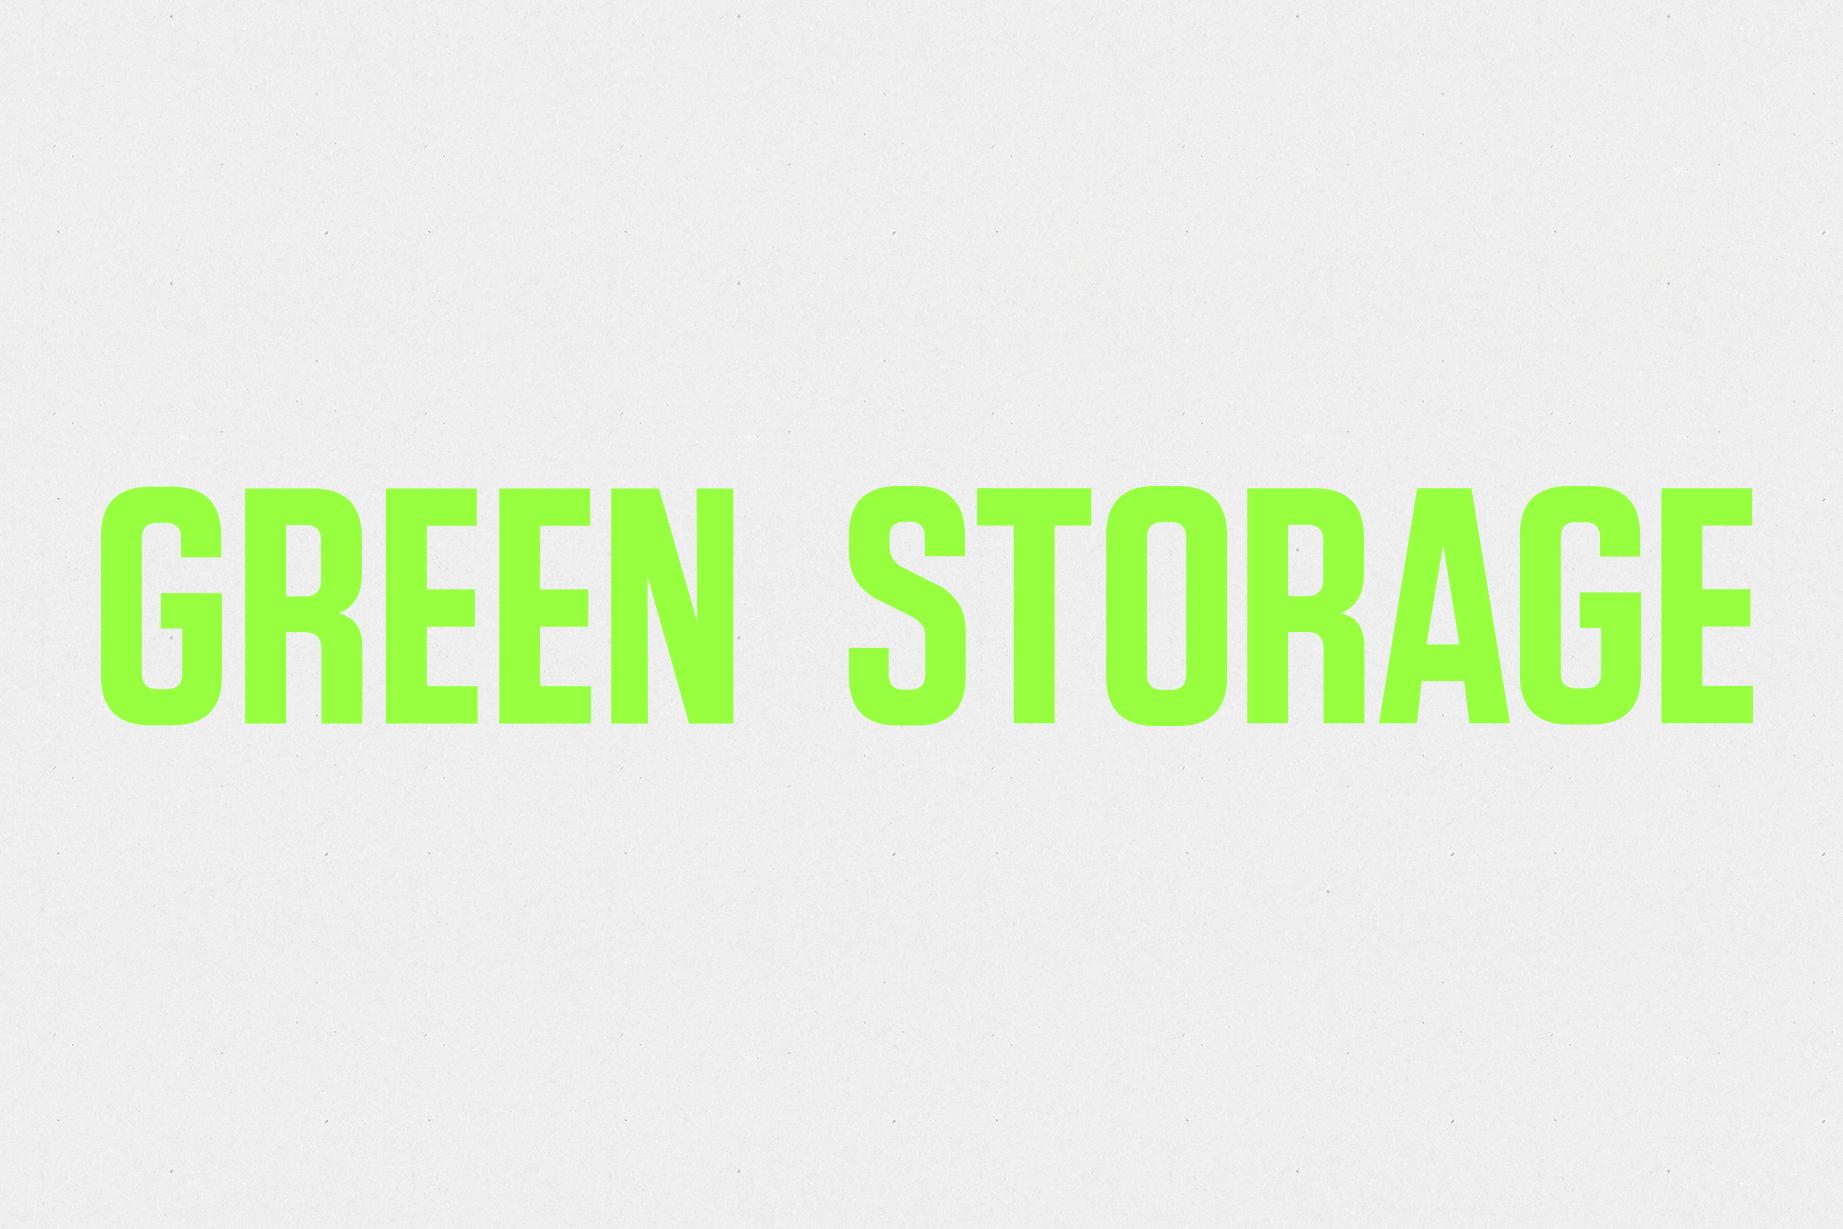 greenstorage.jpg